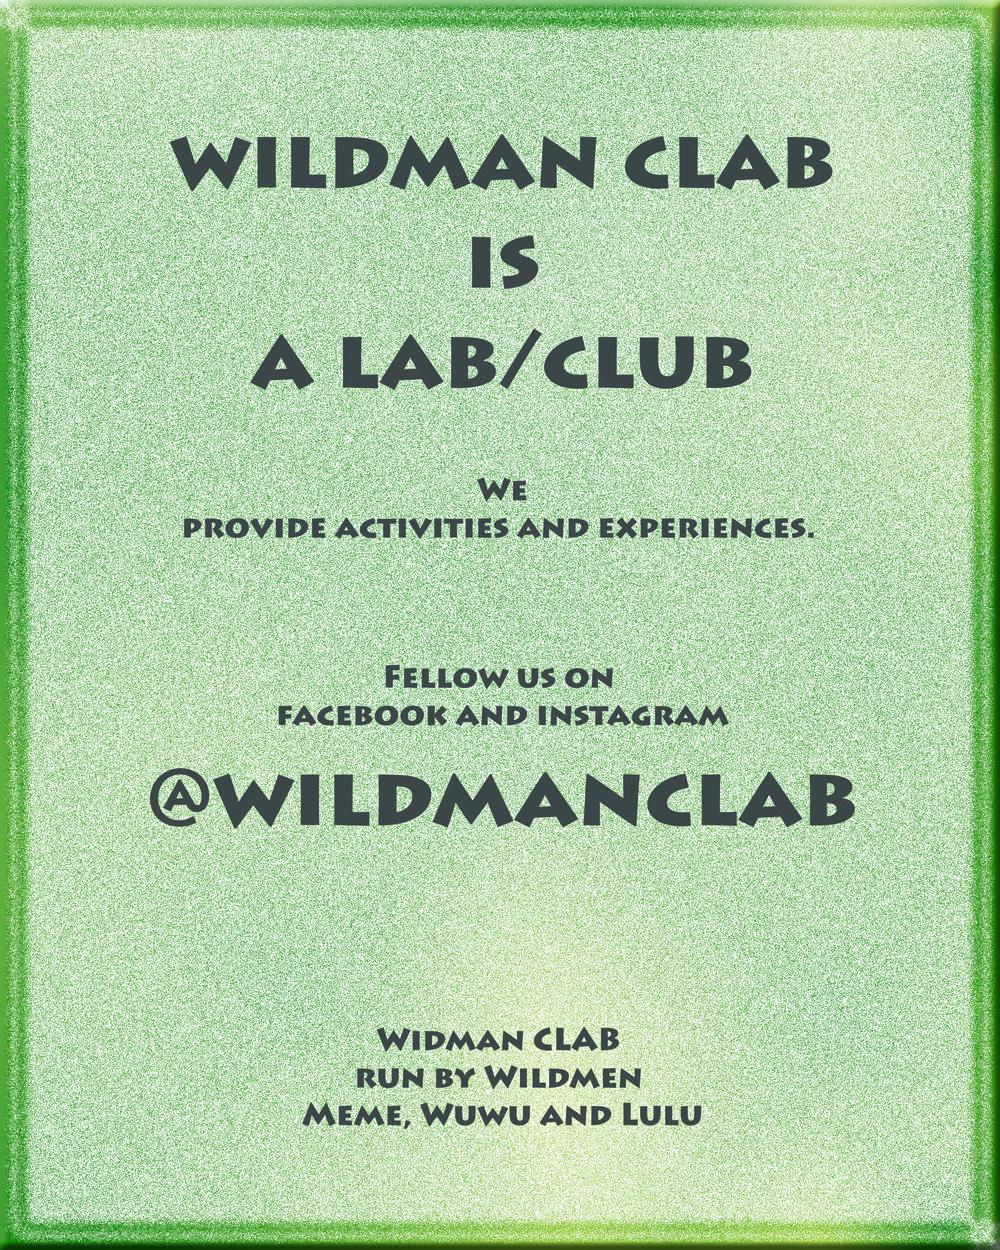 wildmanclab intro poster copy.jpg